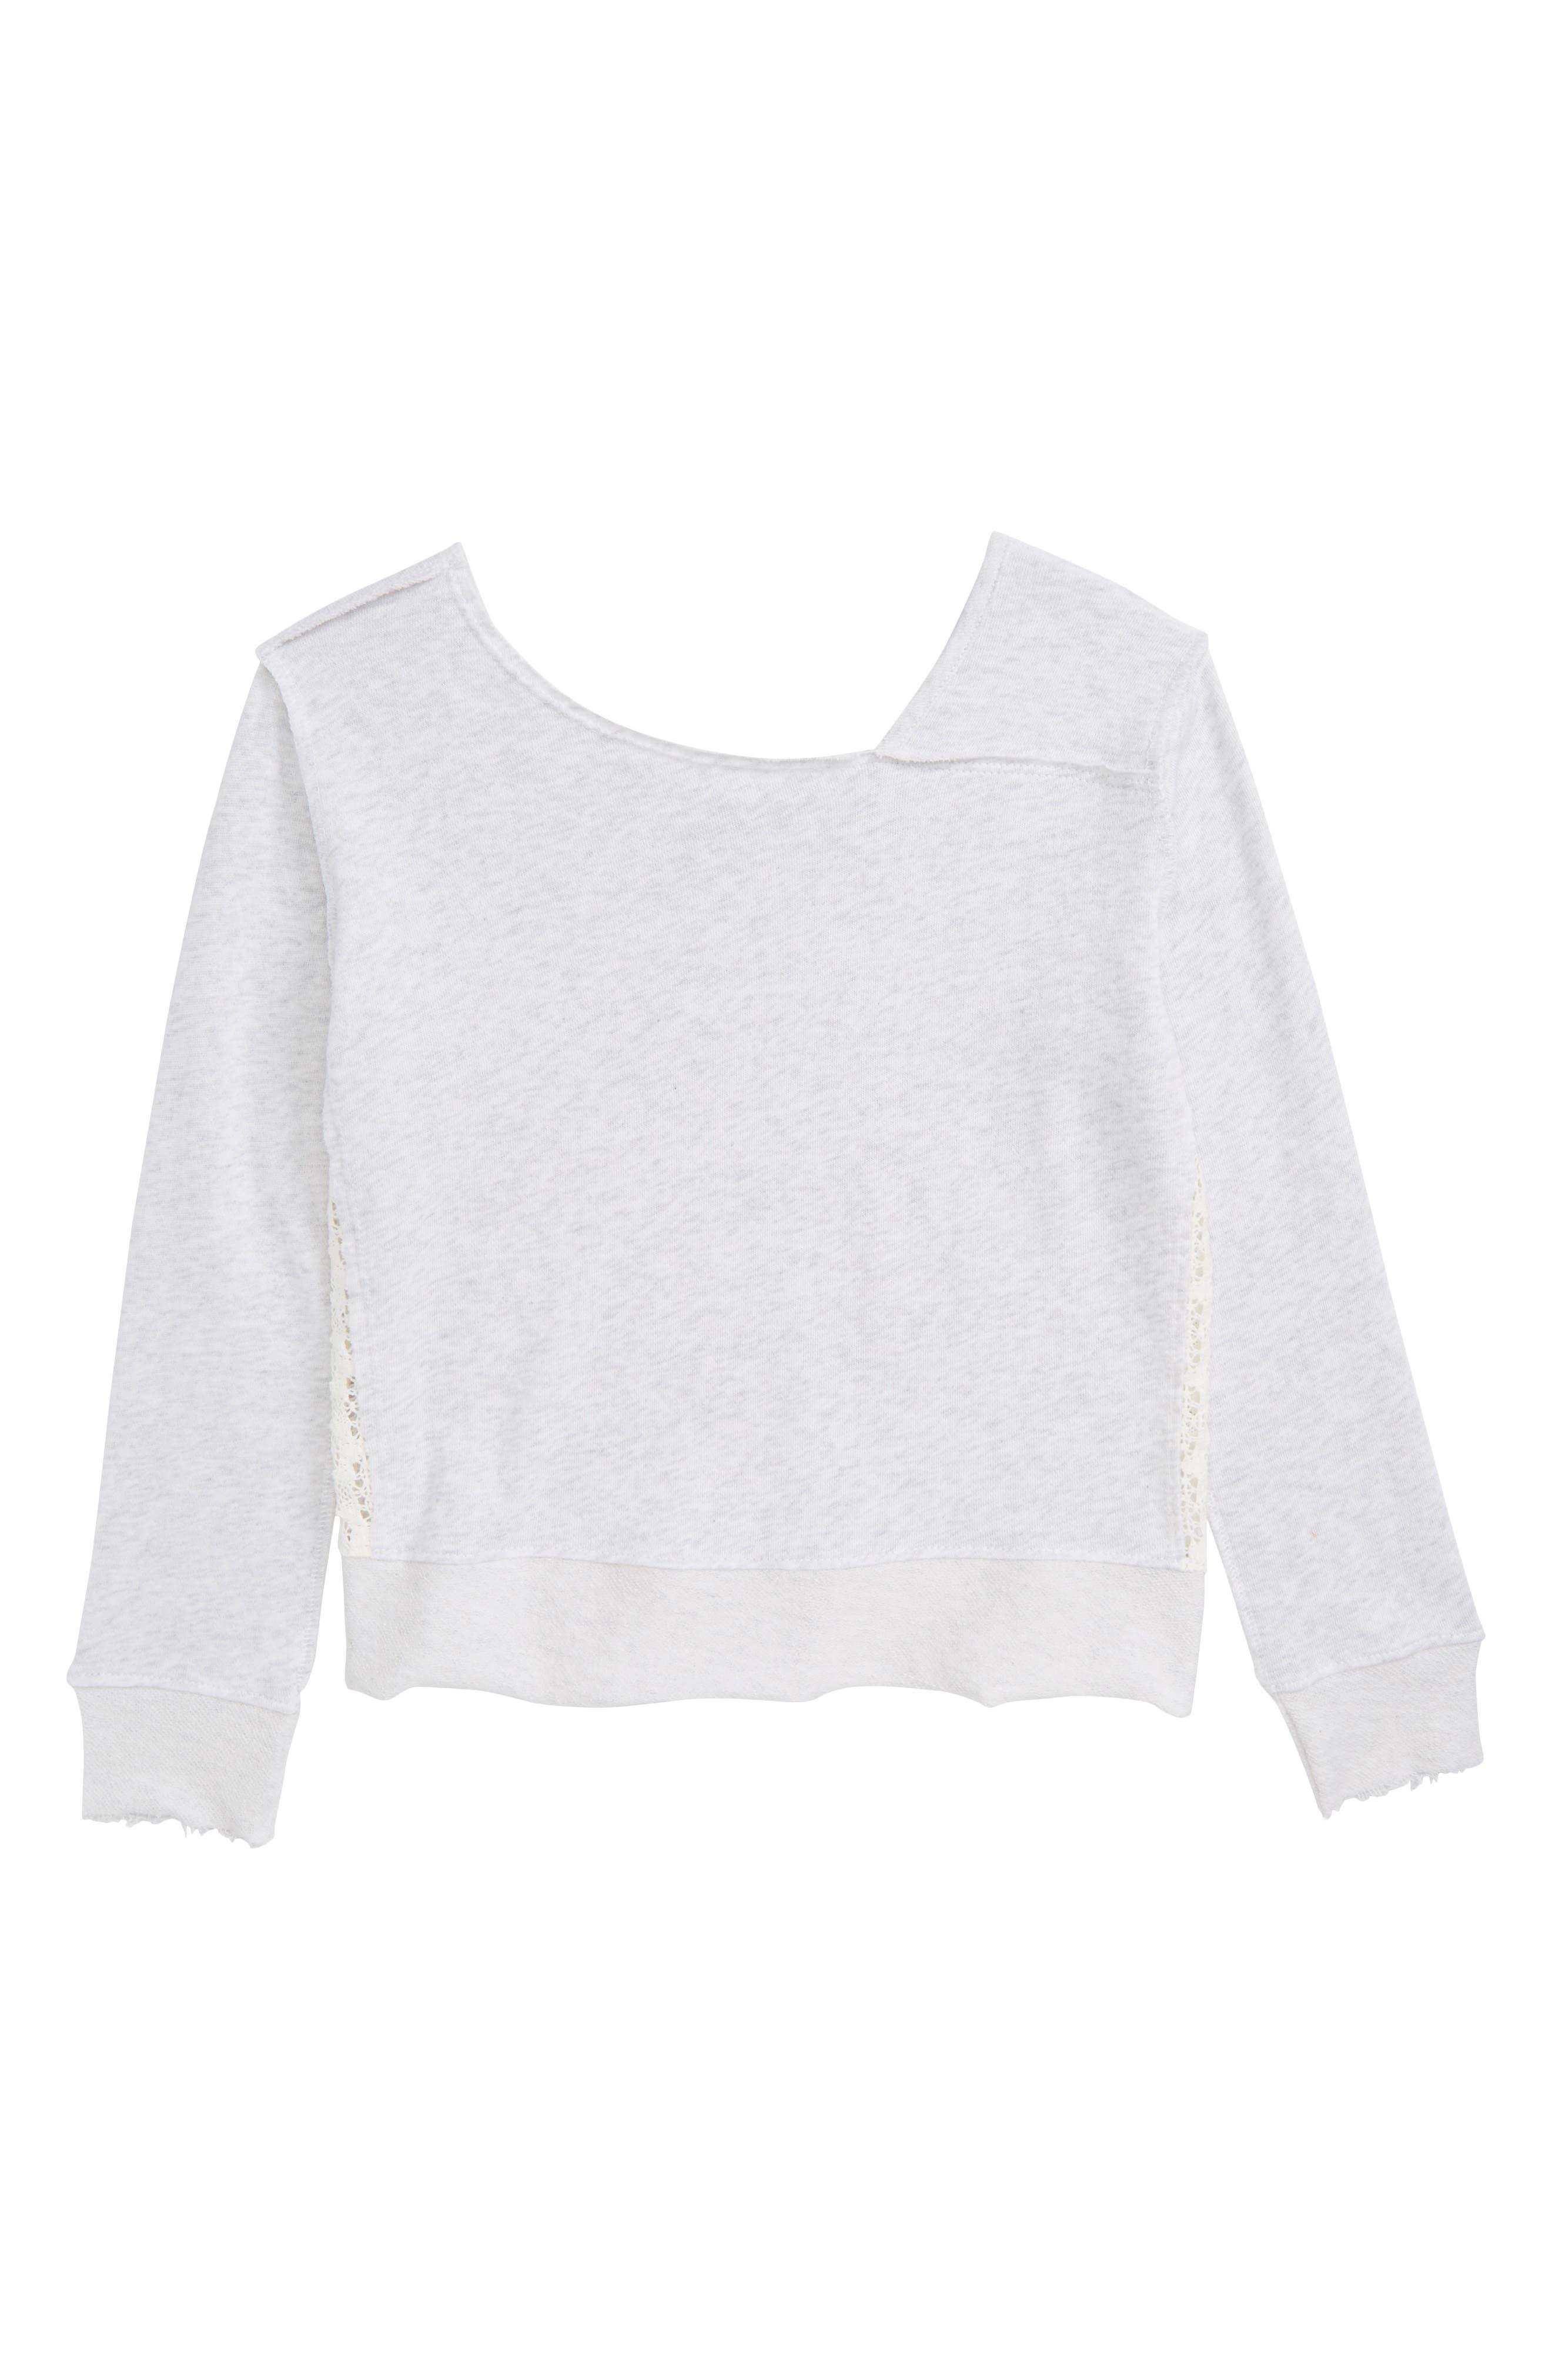 Lace Inset Sweatshirt,                             Main thumbnail 1, color,                             Light Grey Heather